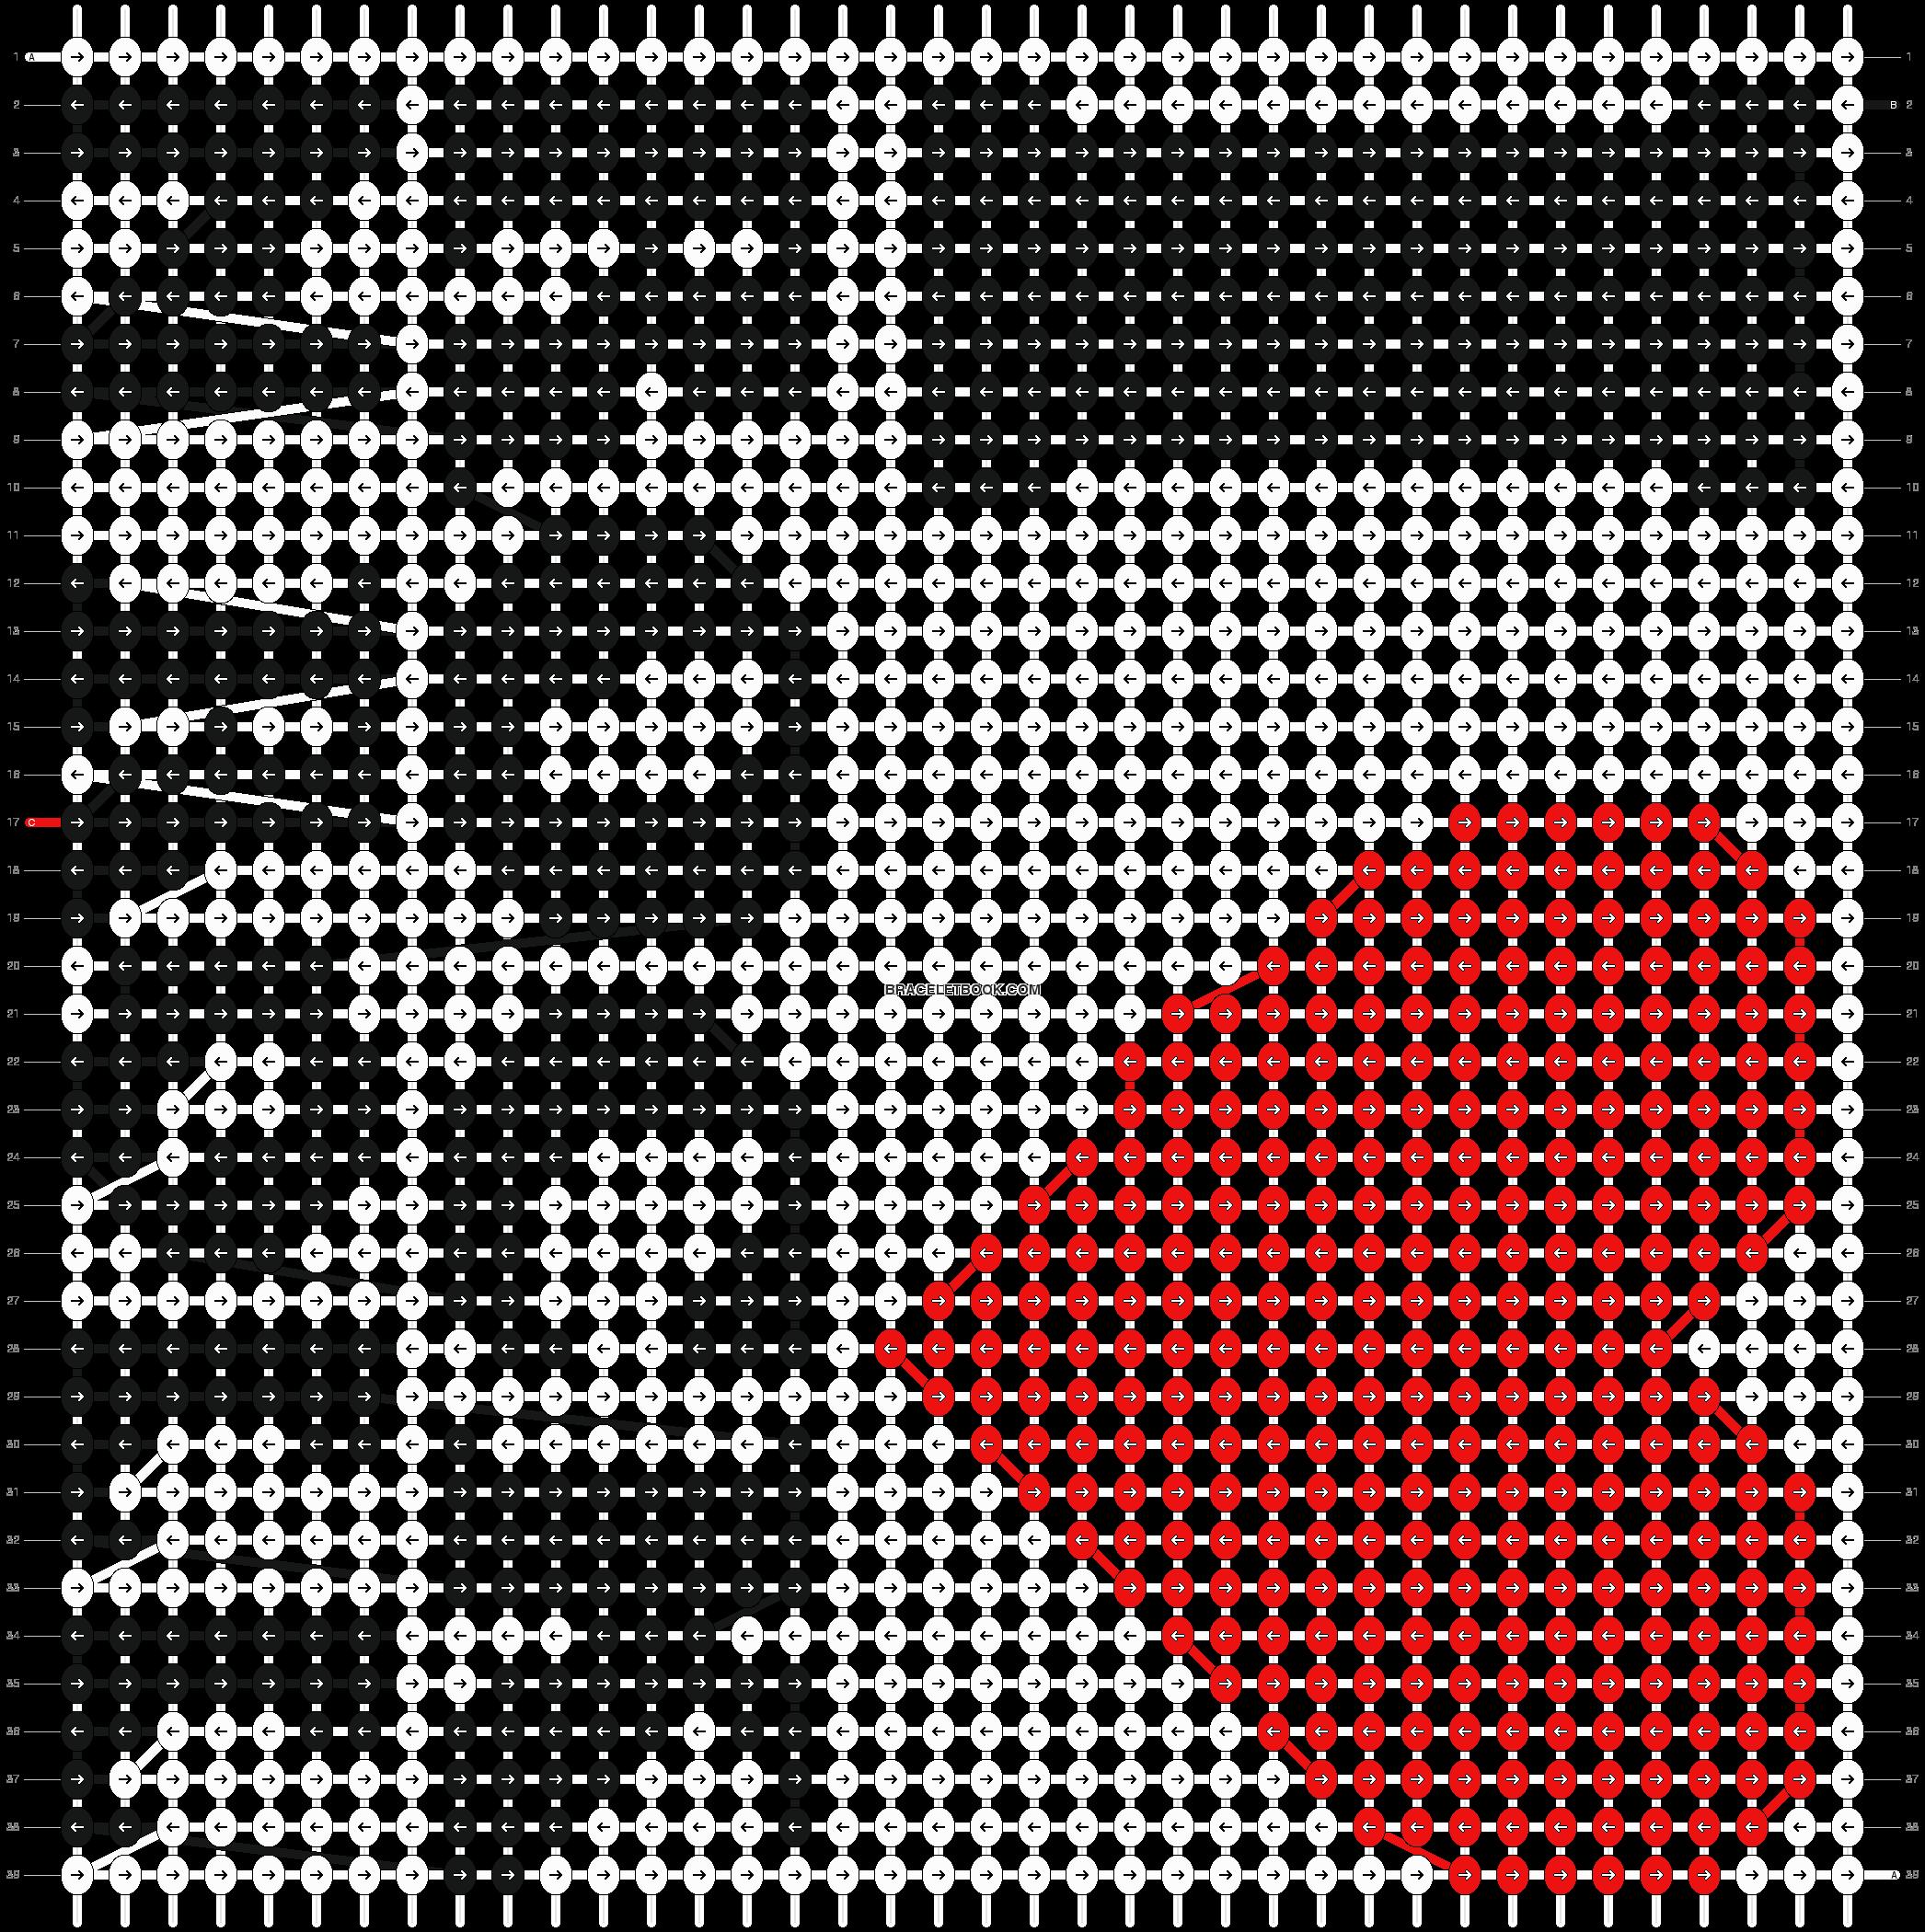 Alpha Pattern #7839 added by whitequeen | CROCHET | Pinterest